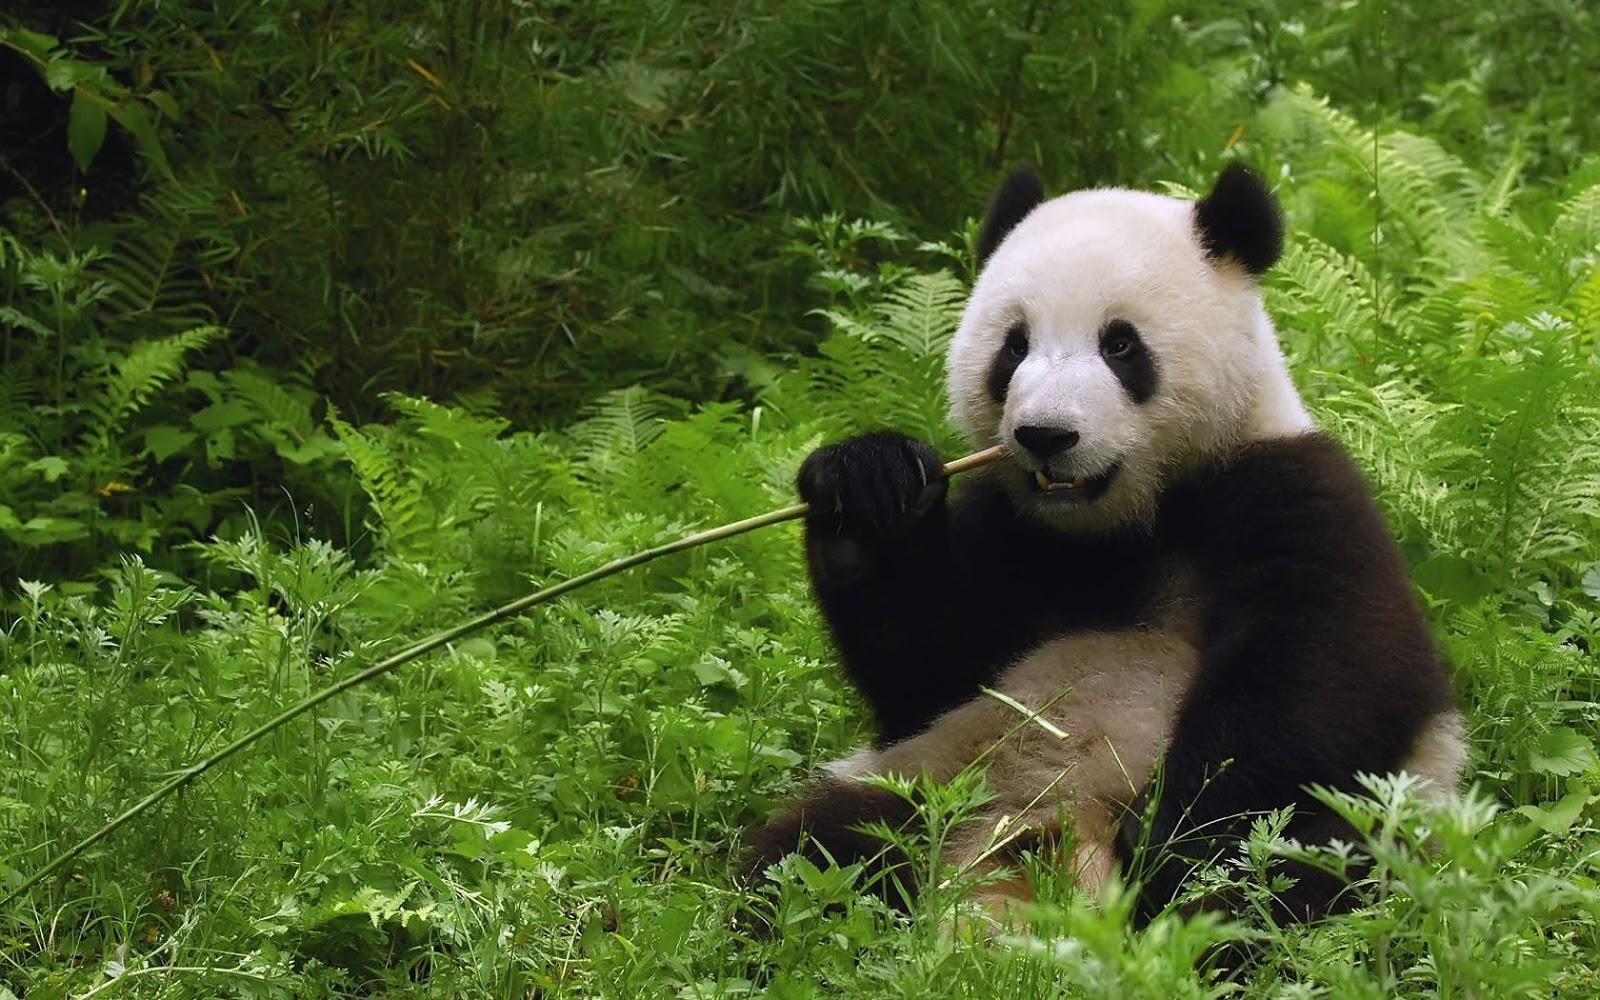 Central Wallpaper: Cute Panda Bears HD Wallpapers